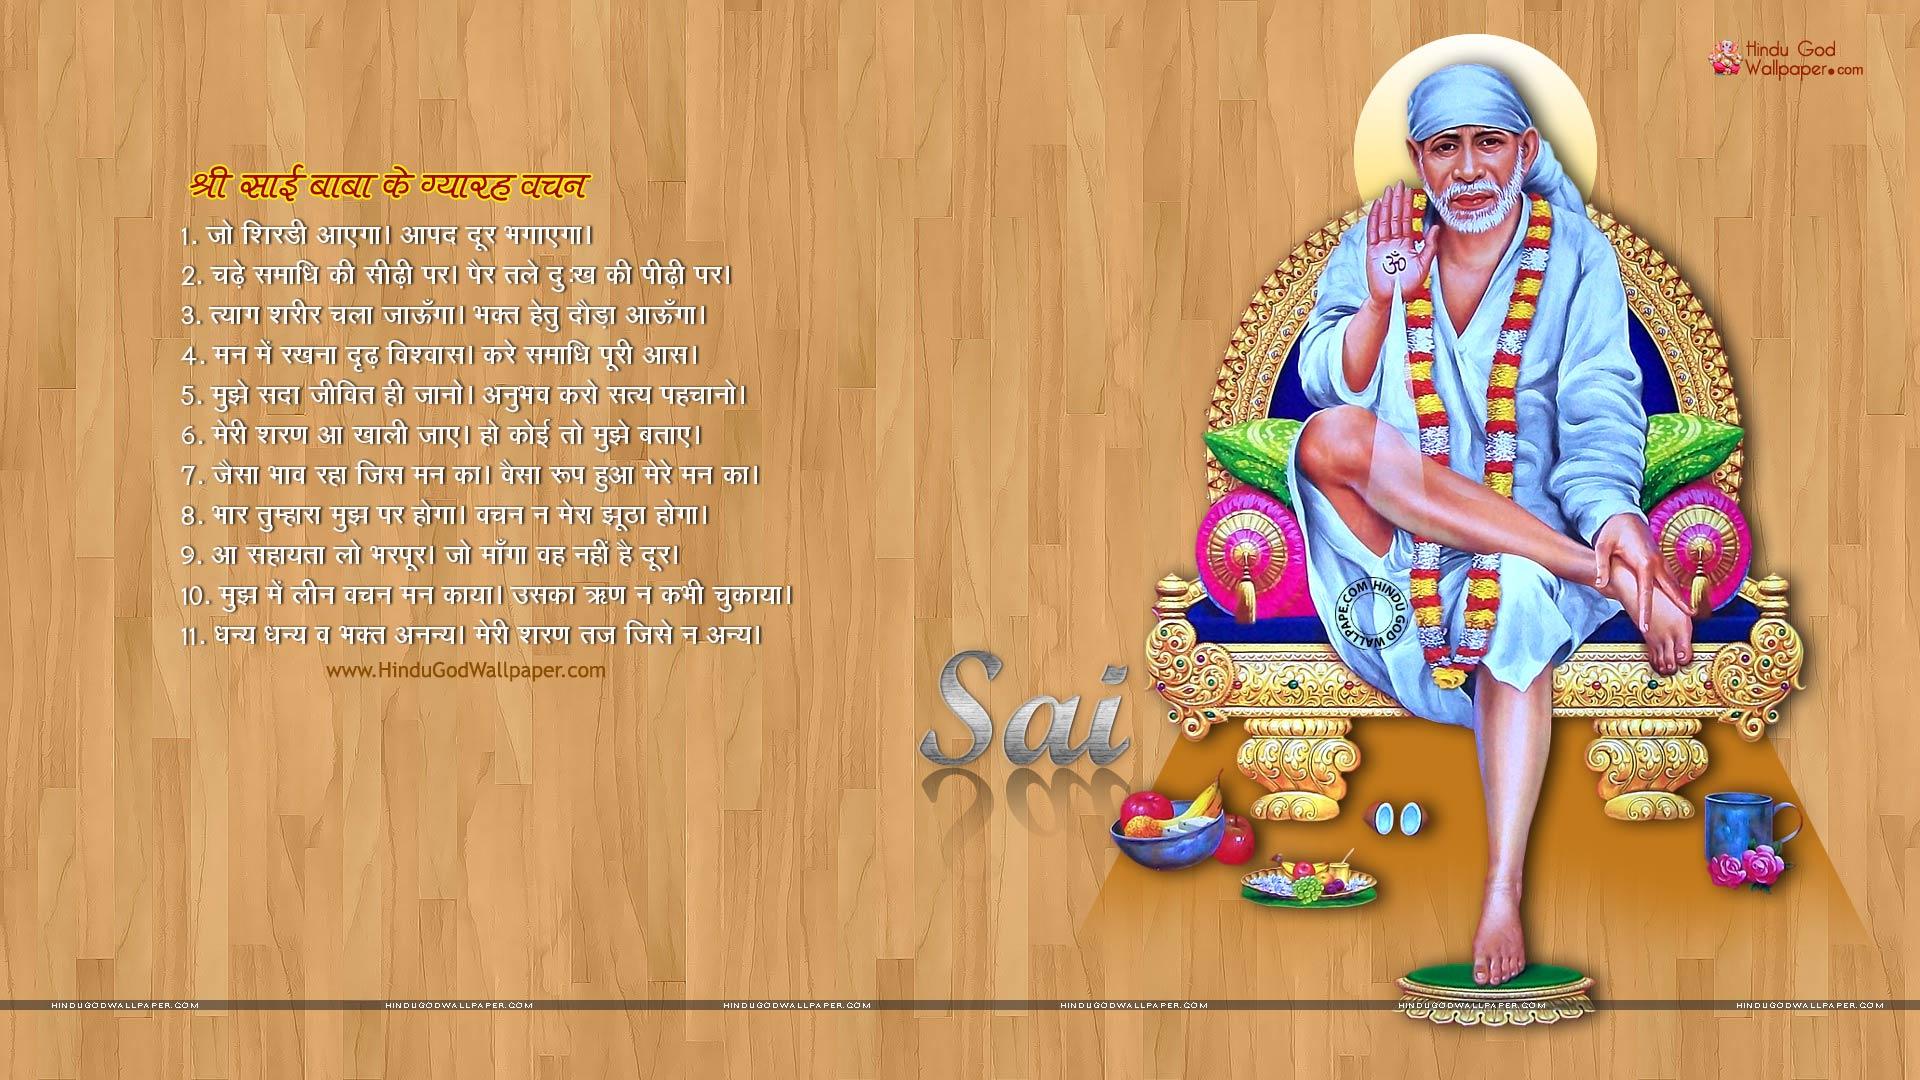 Shirdi Sai Baba Hd Wallpaper Full Size 1080p Download